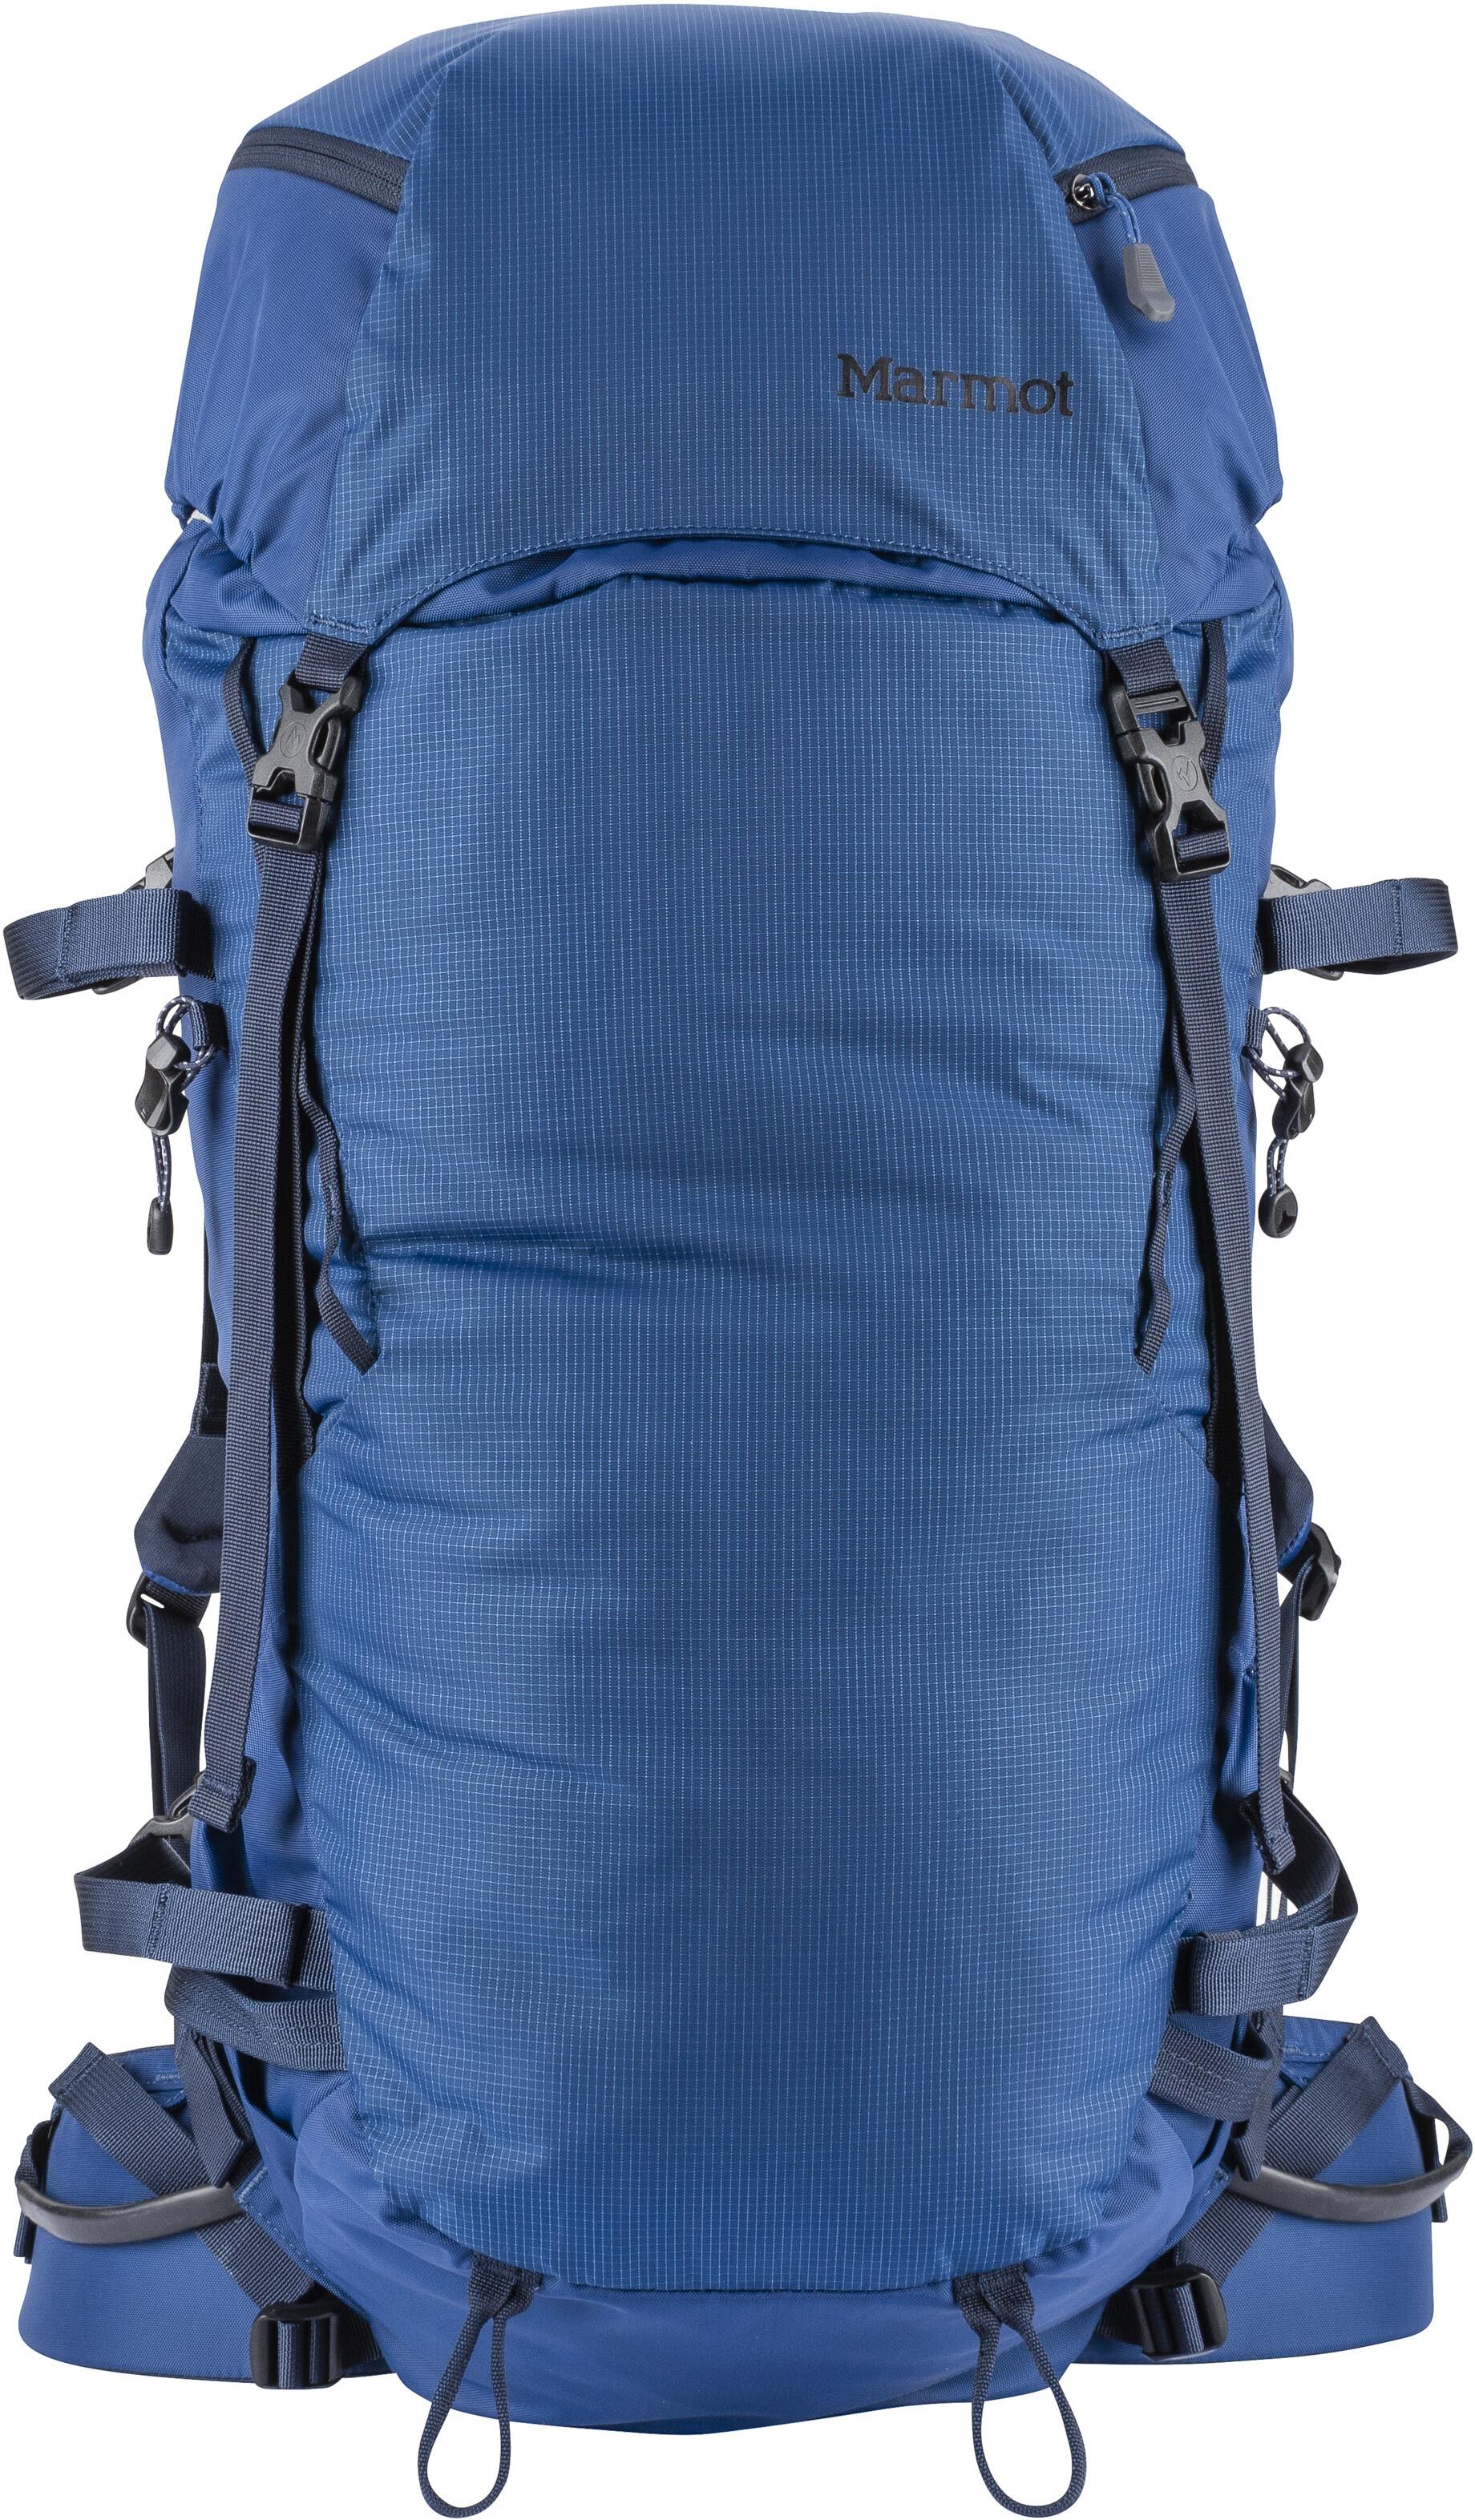 2ce0e4c4c5 Marmot Eiger Rock Zaino blu su Addnature